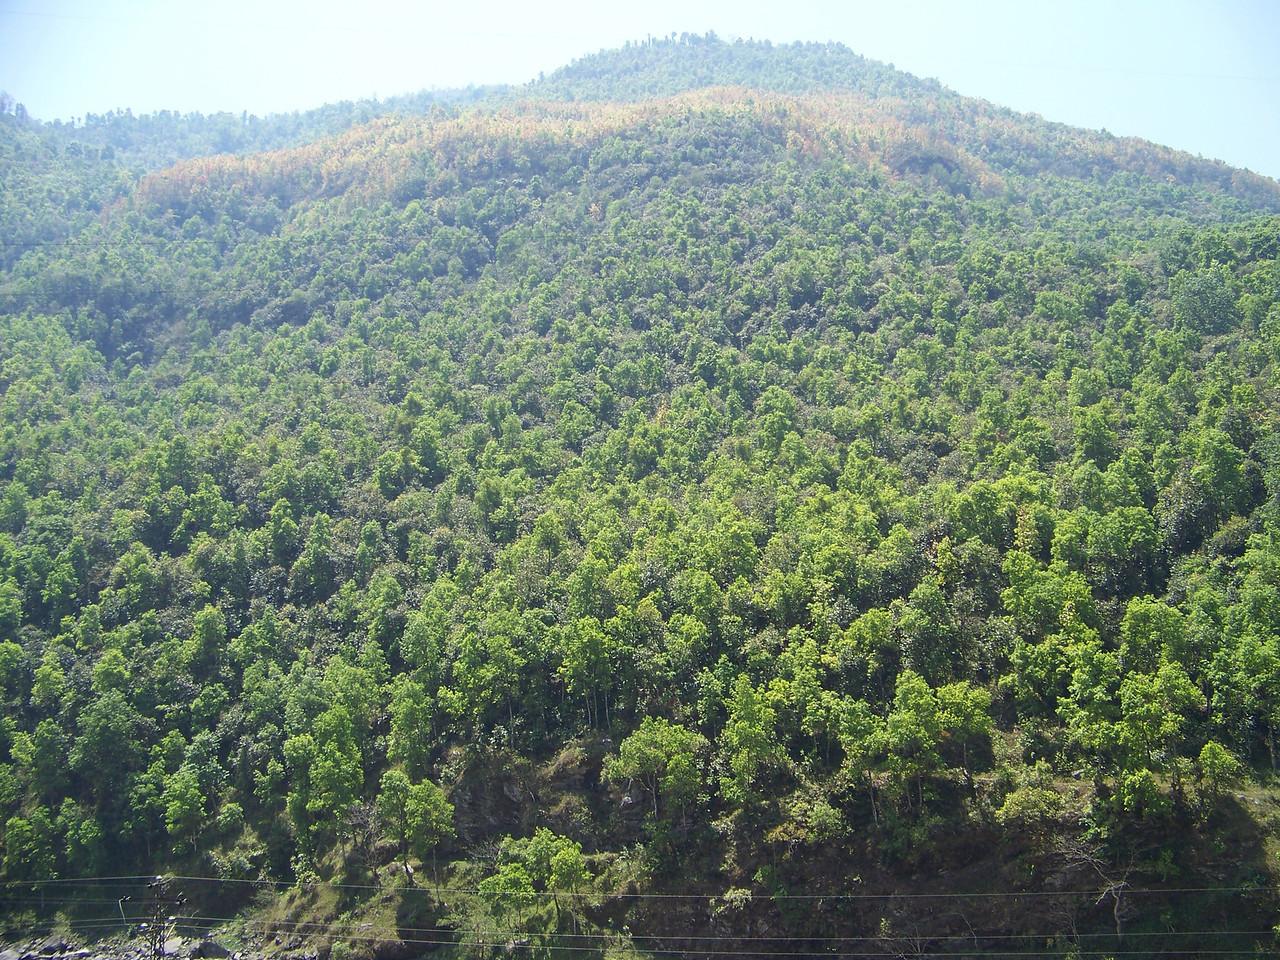 0655 - Scenery along Araniko Highway in Nepal Between Kodari and Katmandu - Nepal.JPG